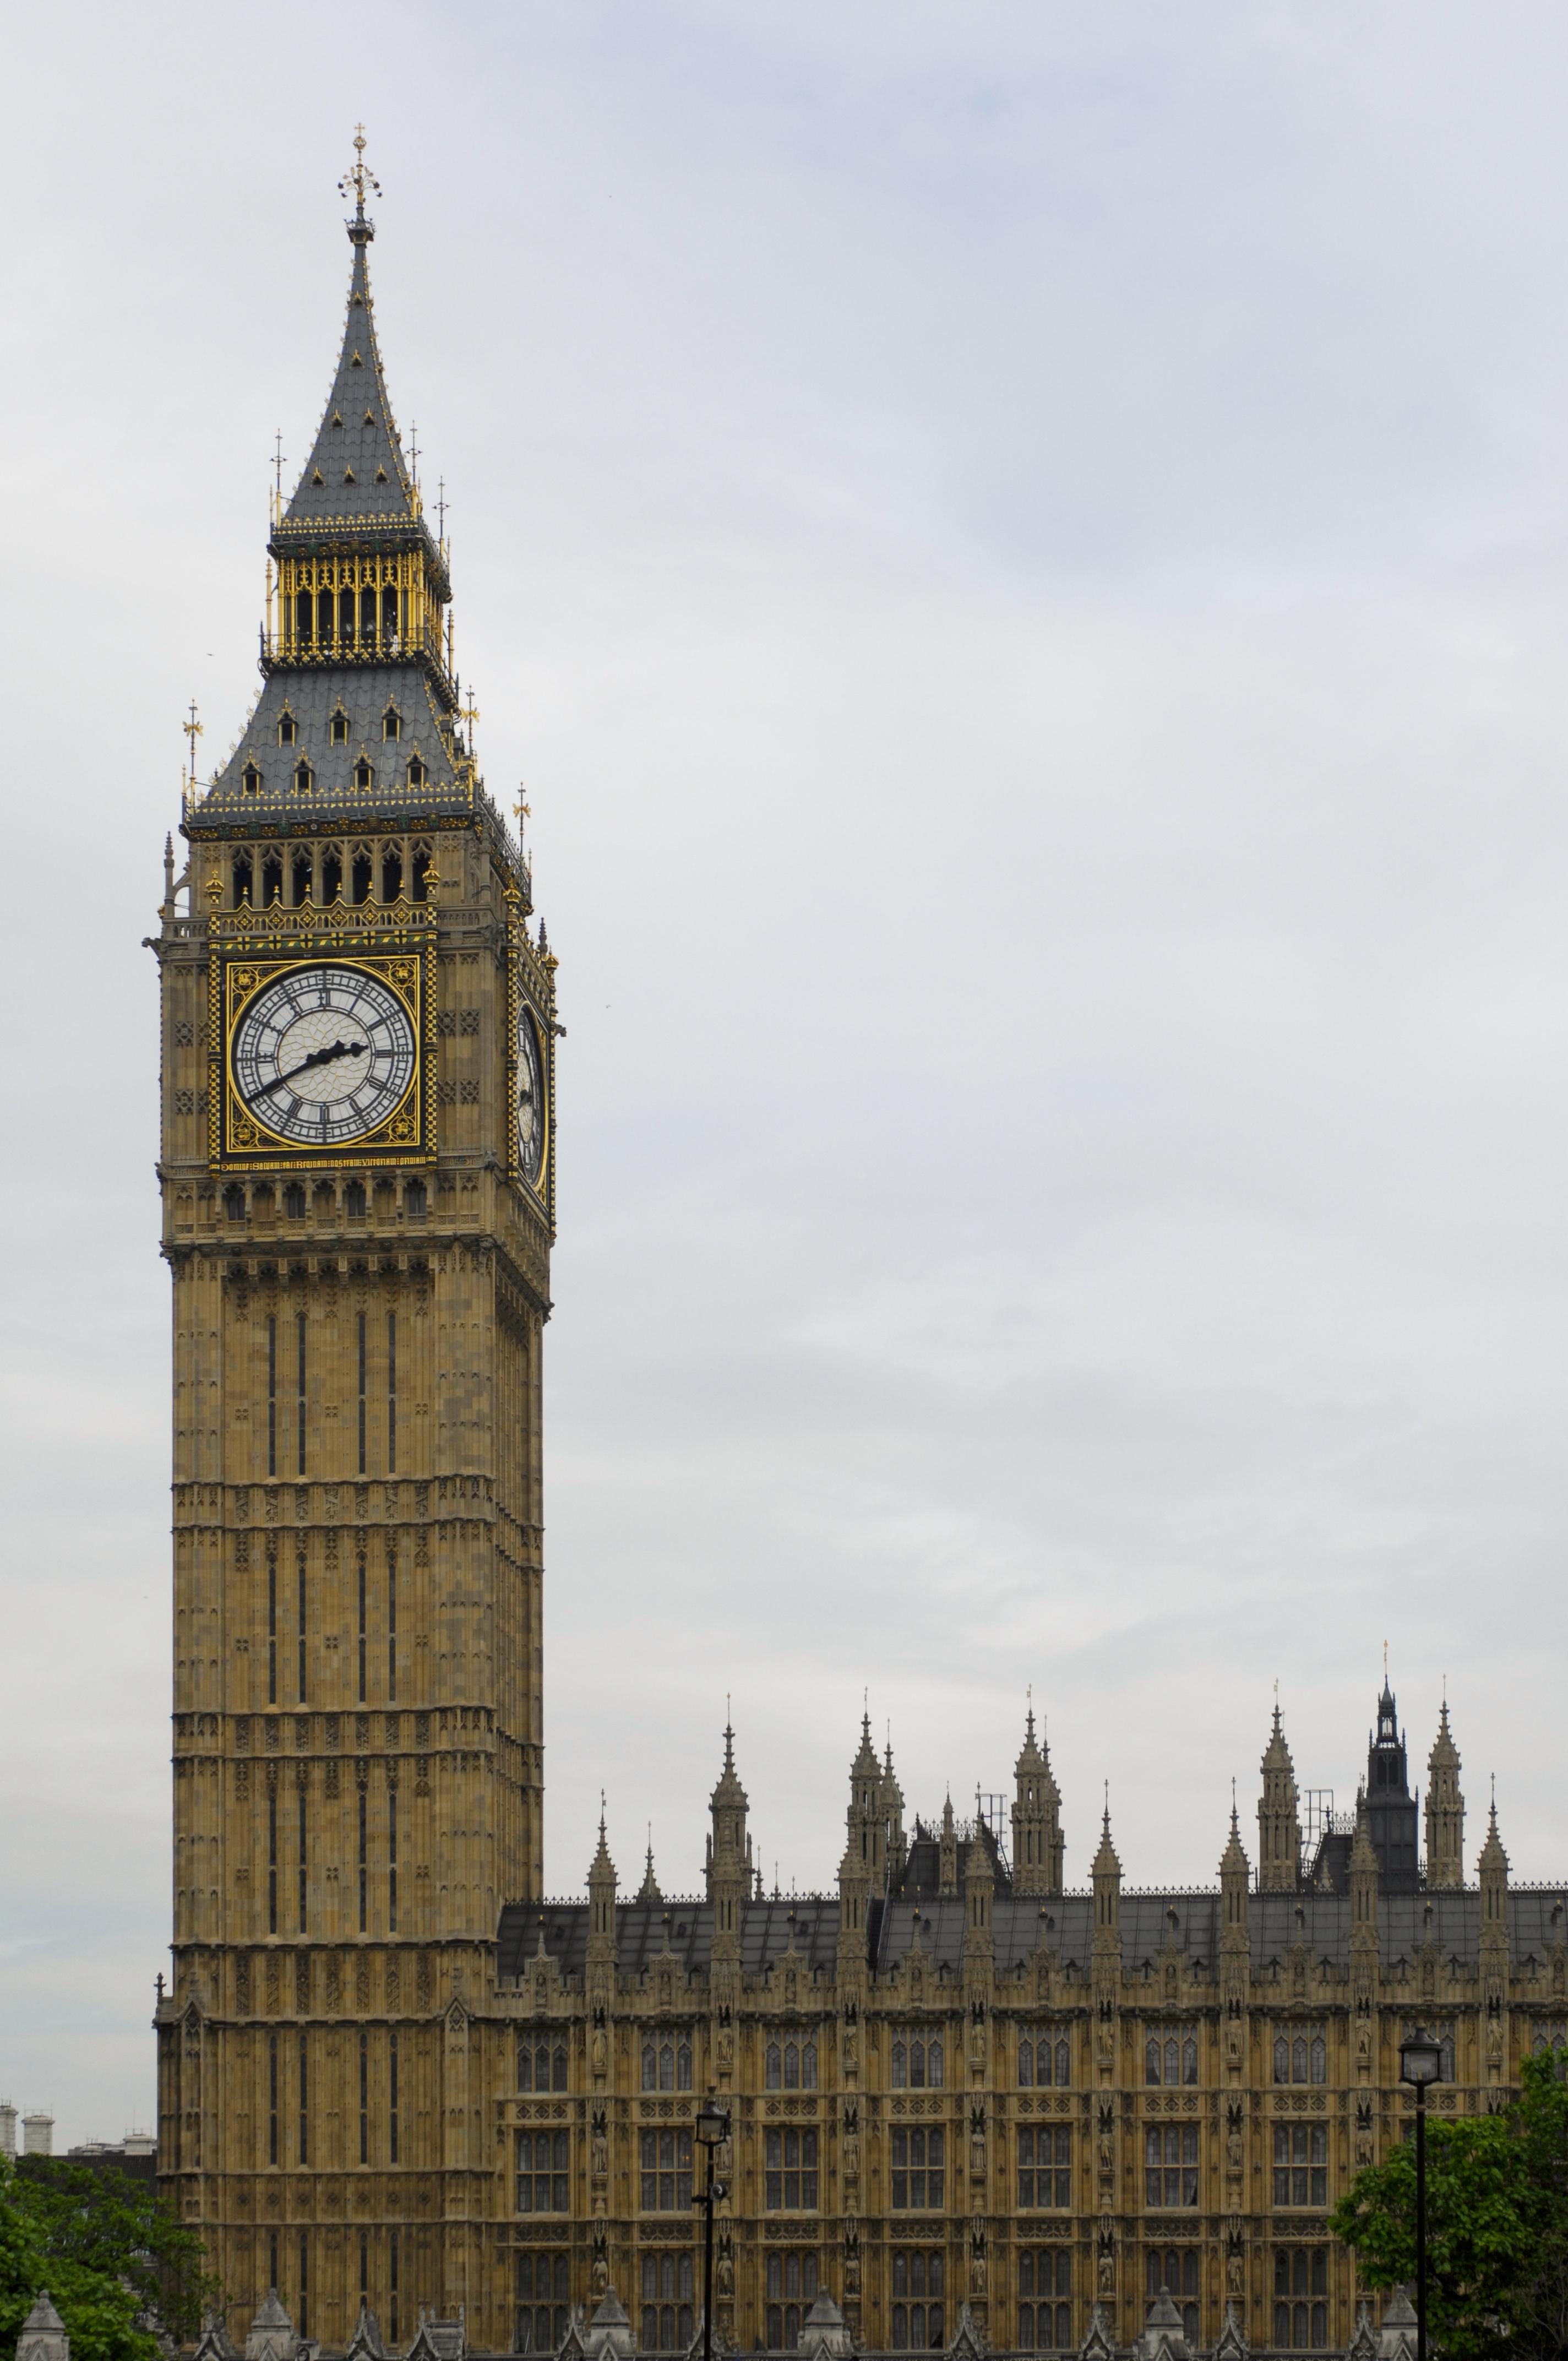 File:Big Ben clock tower (London, 2009) 03.jpg - Wikimedia ...